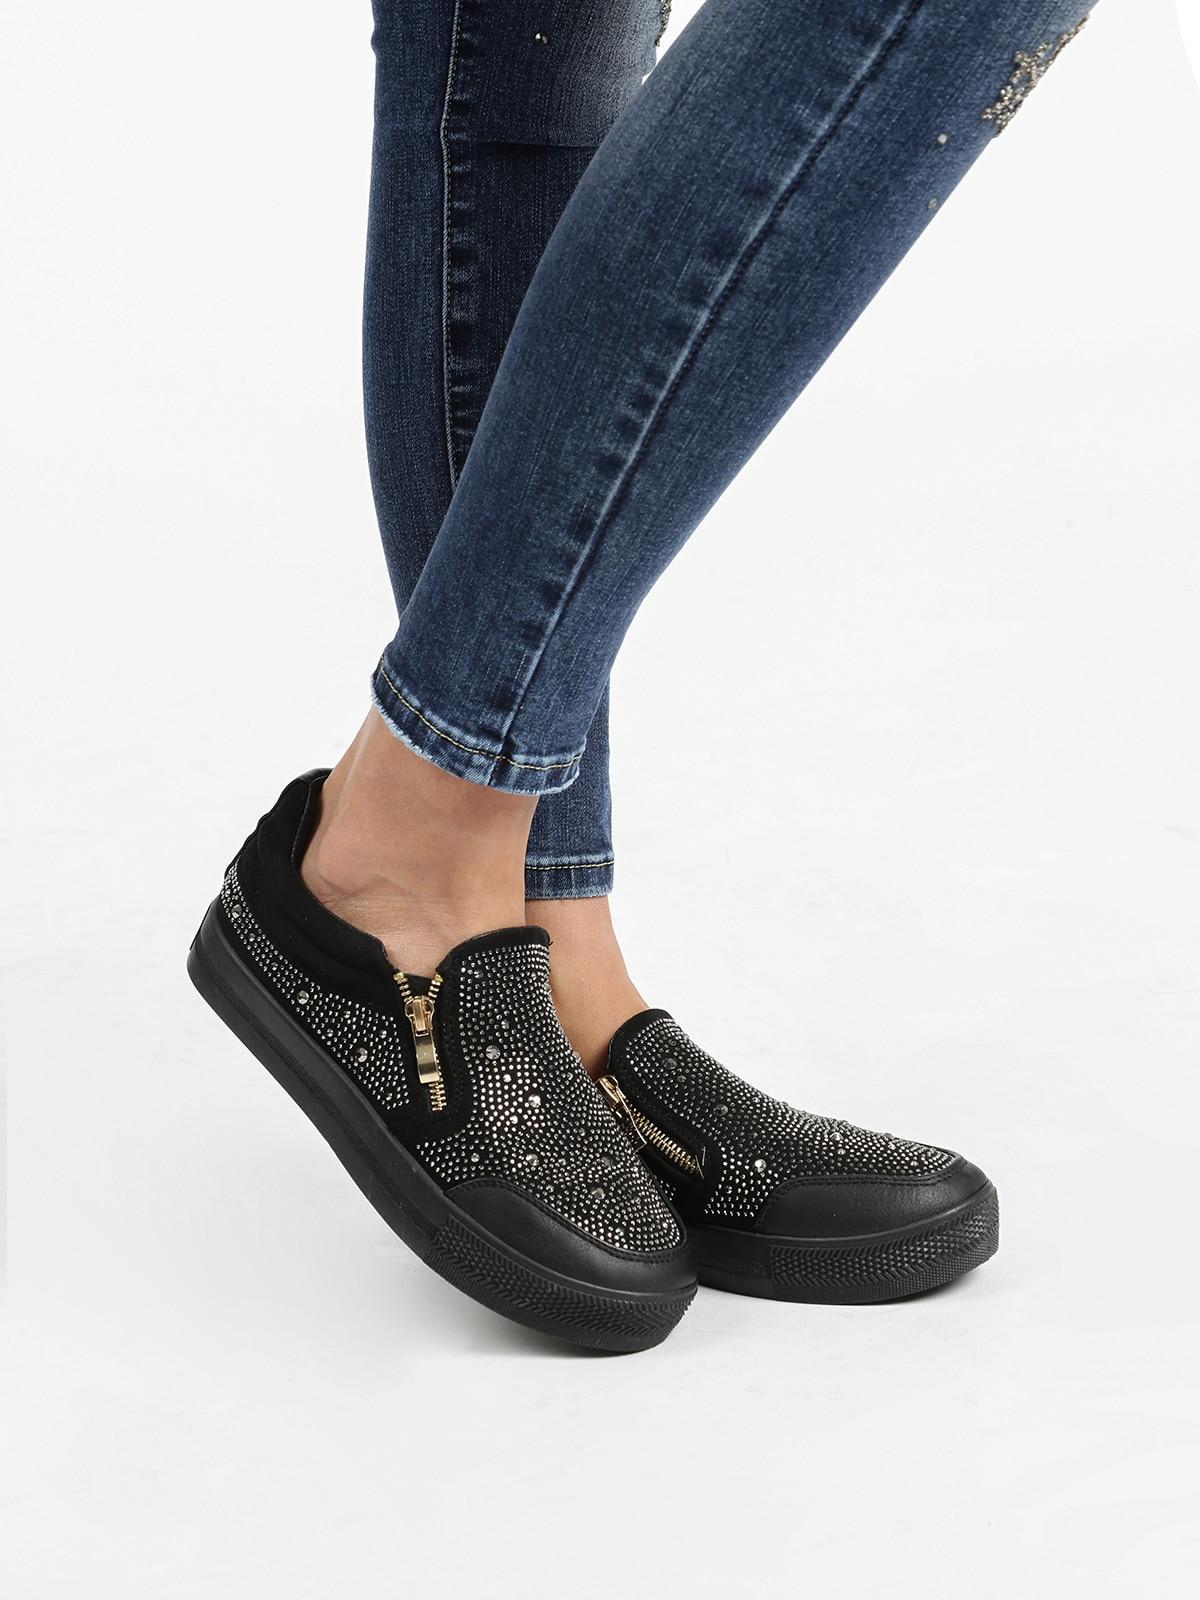 Flat Sneakers With Rhinestone